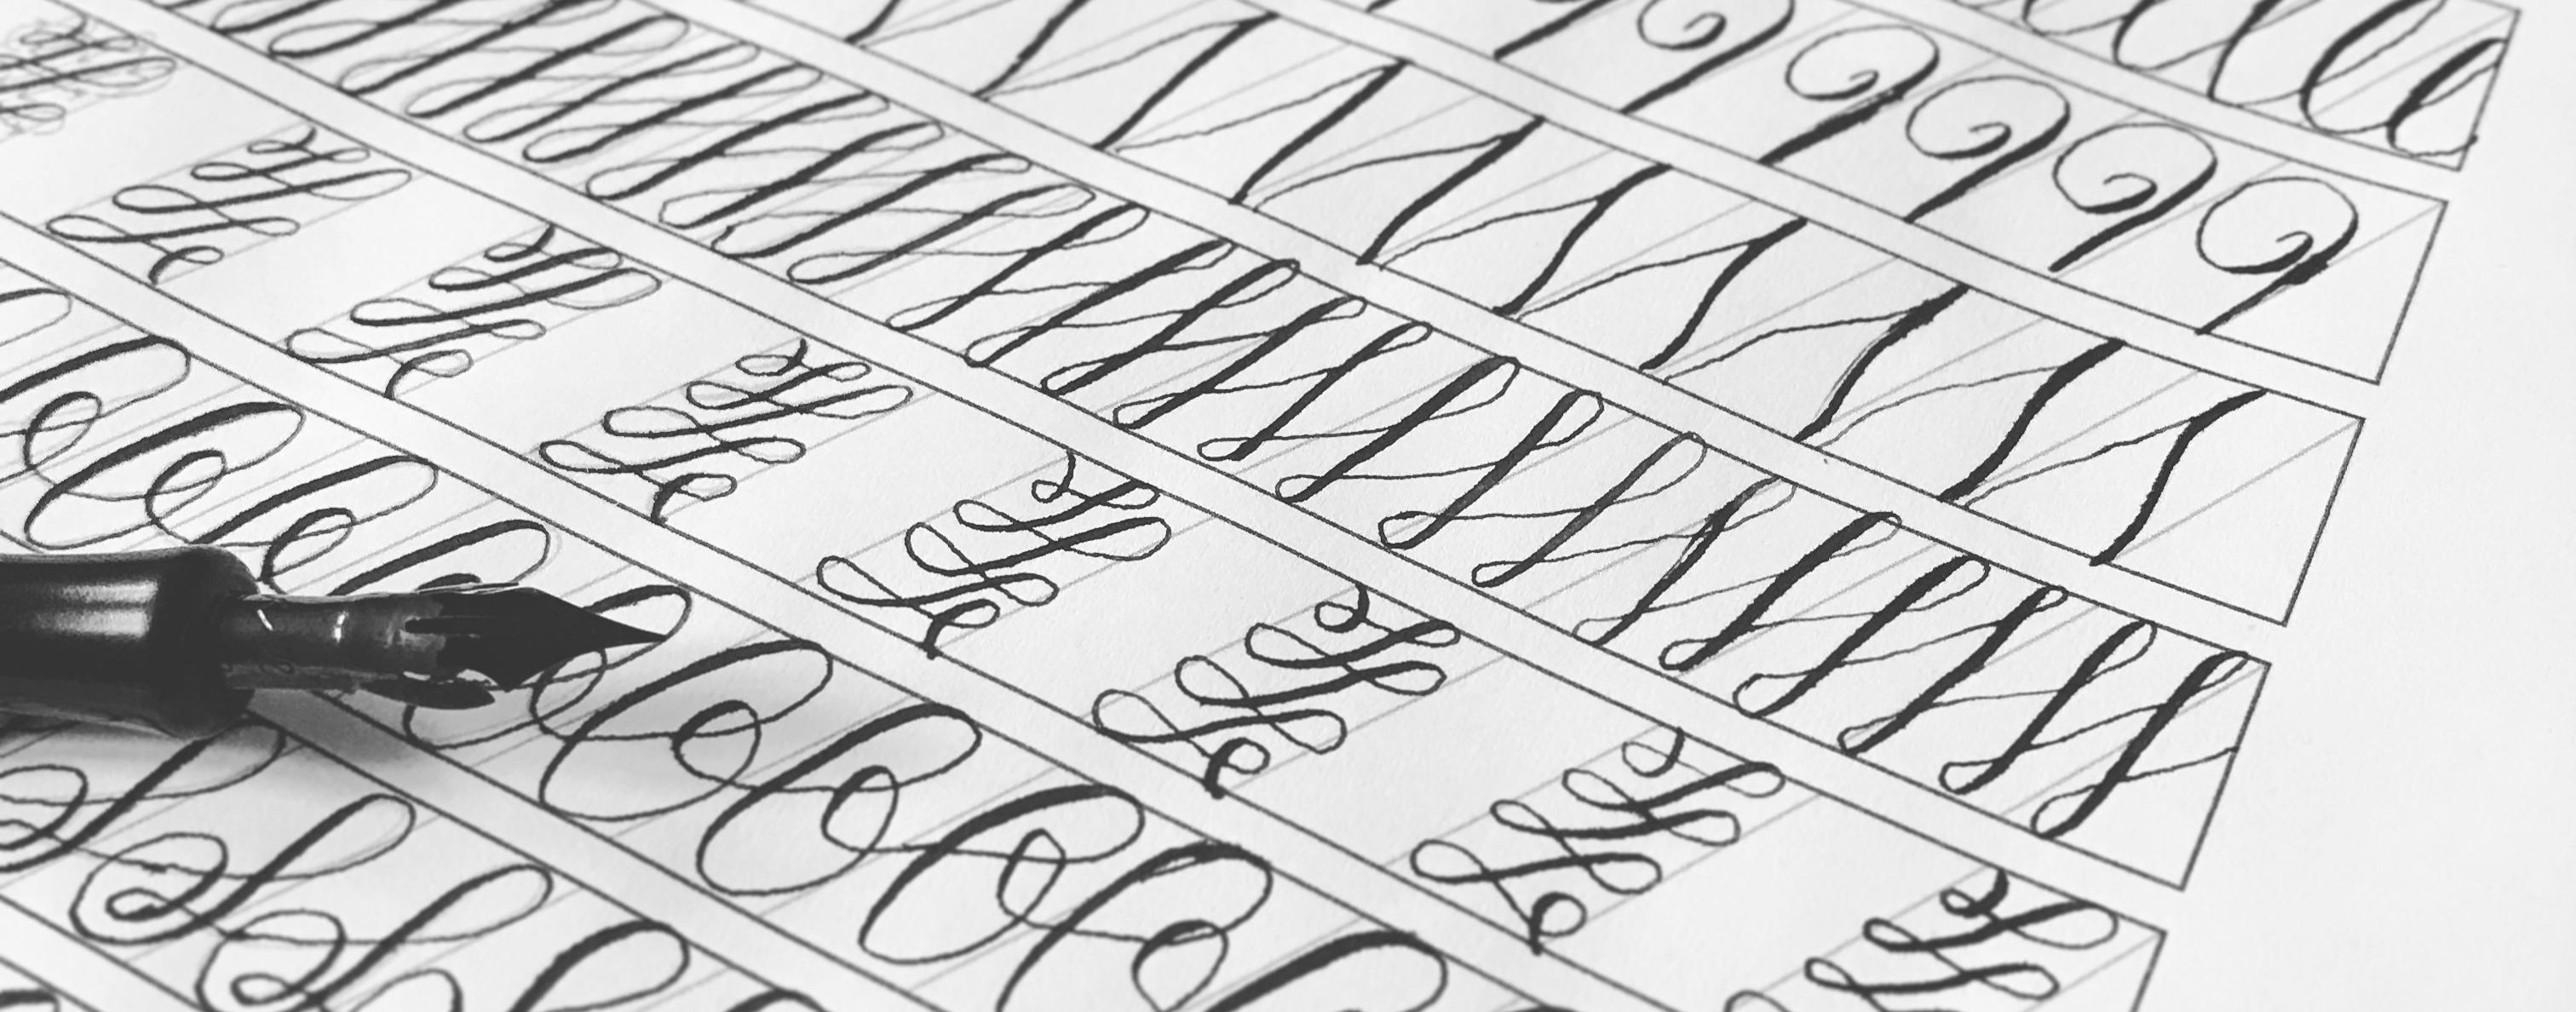 Calligraphy Practice Worksheets